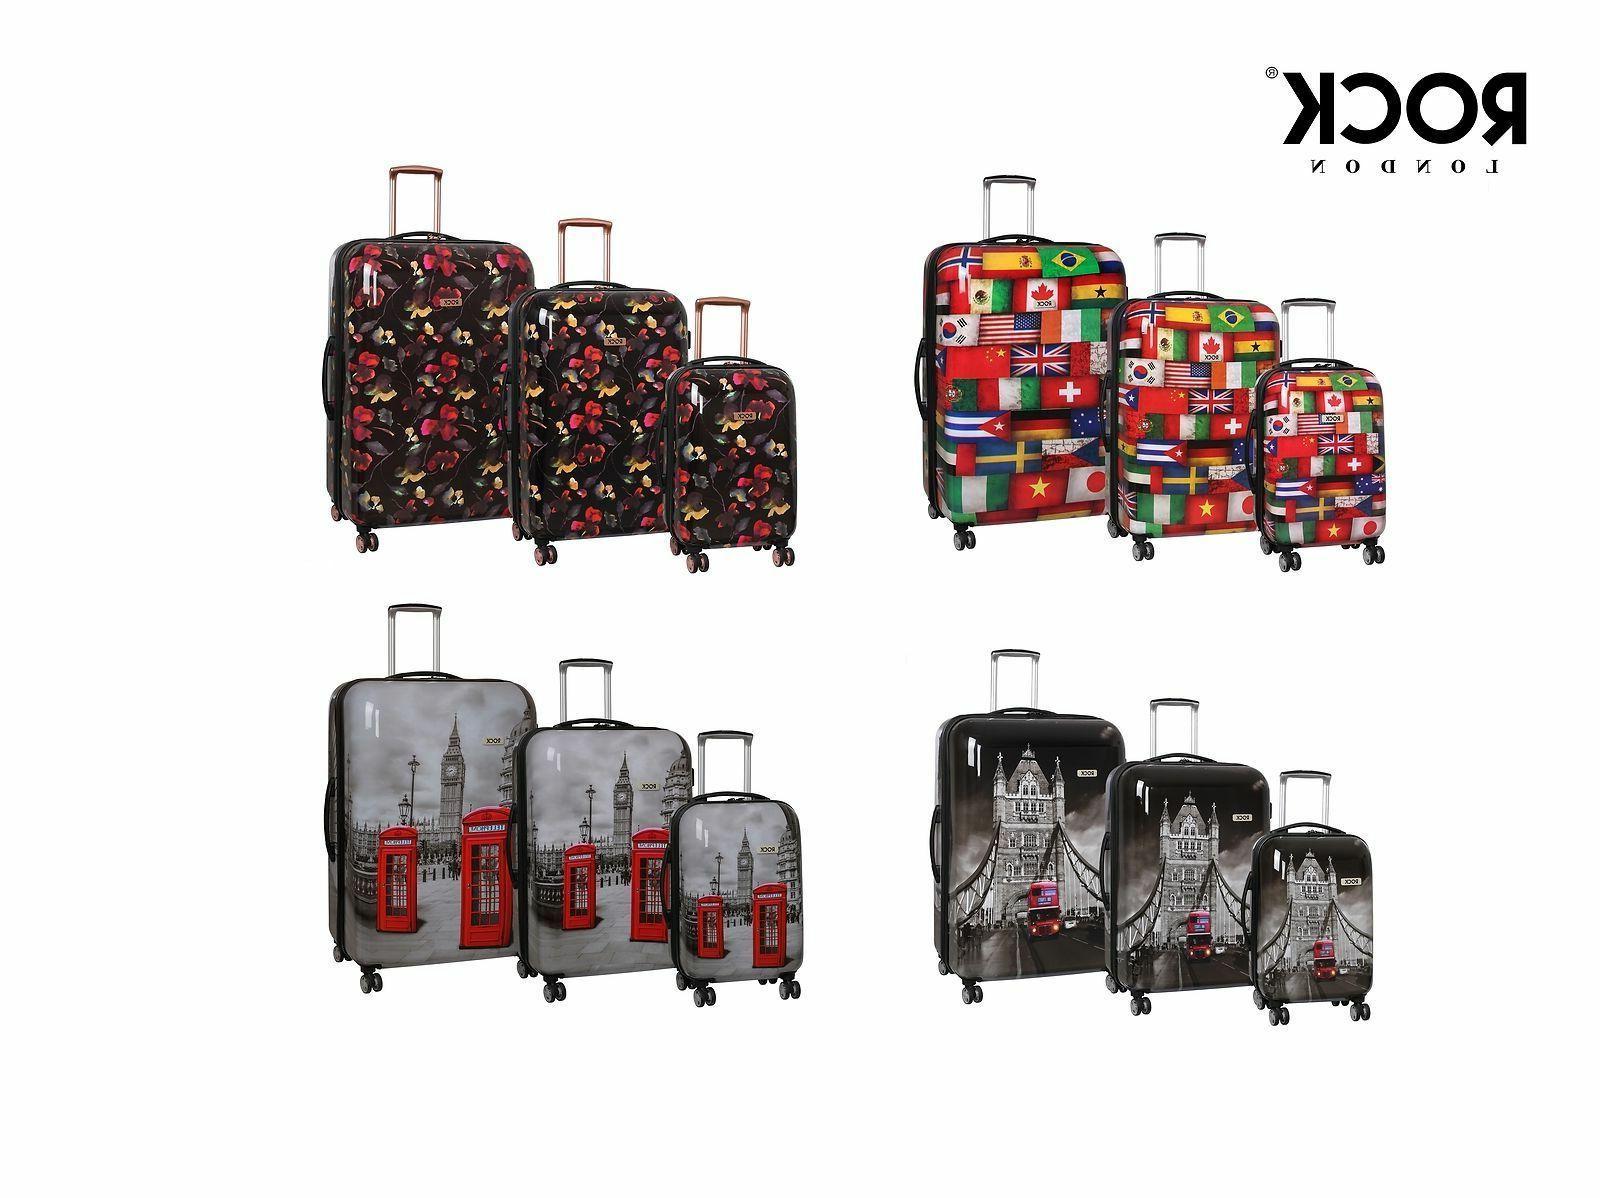 montana expandable 8 wheel hardshell spinner suitcase